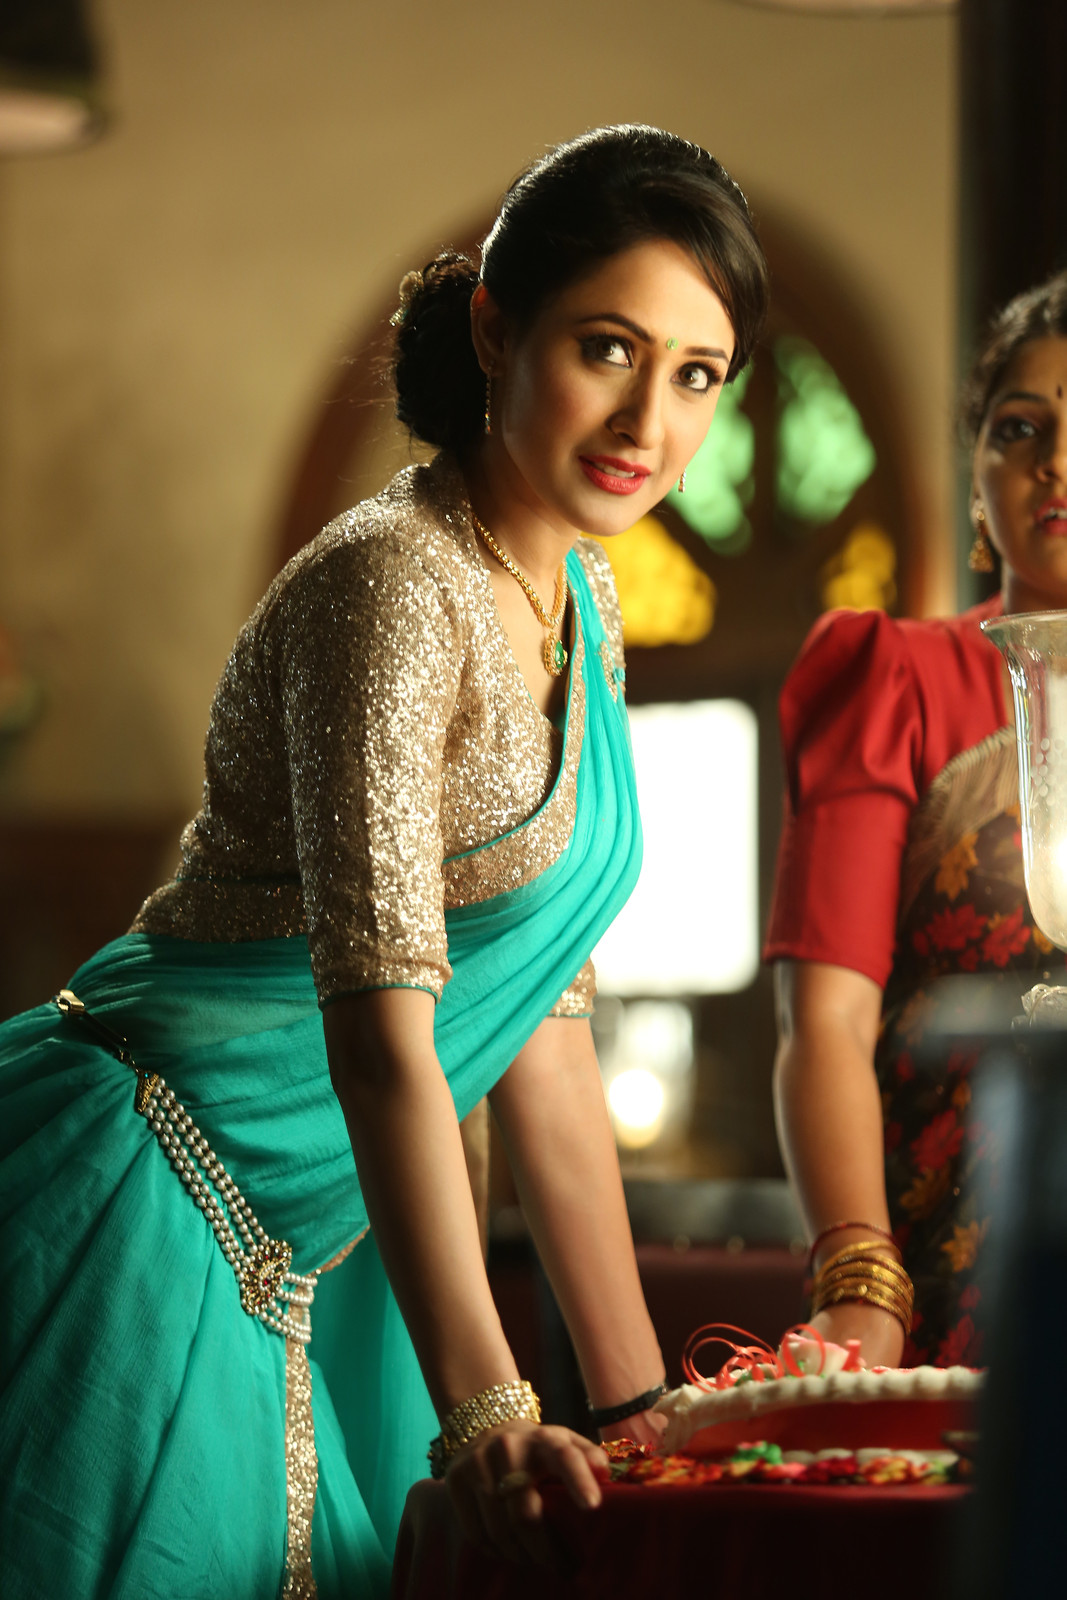 Nayanthara Latest Photos From The Movie Babu Bangaram – Cine Desire